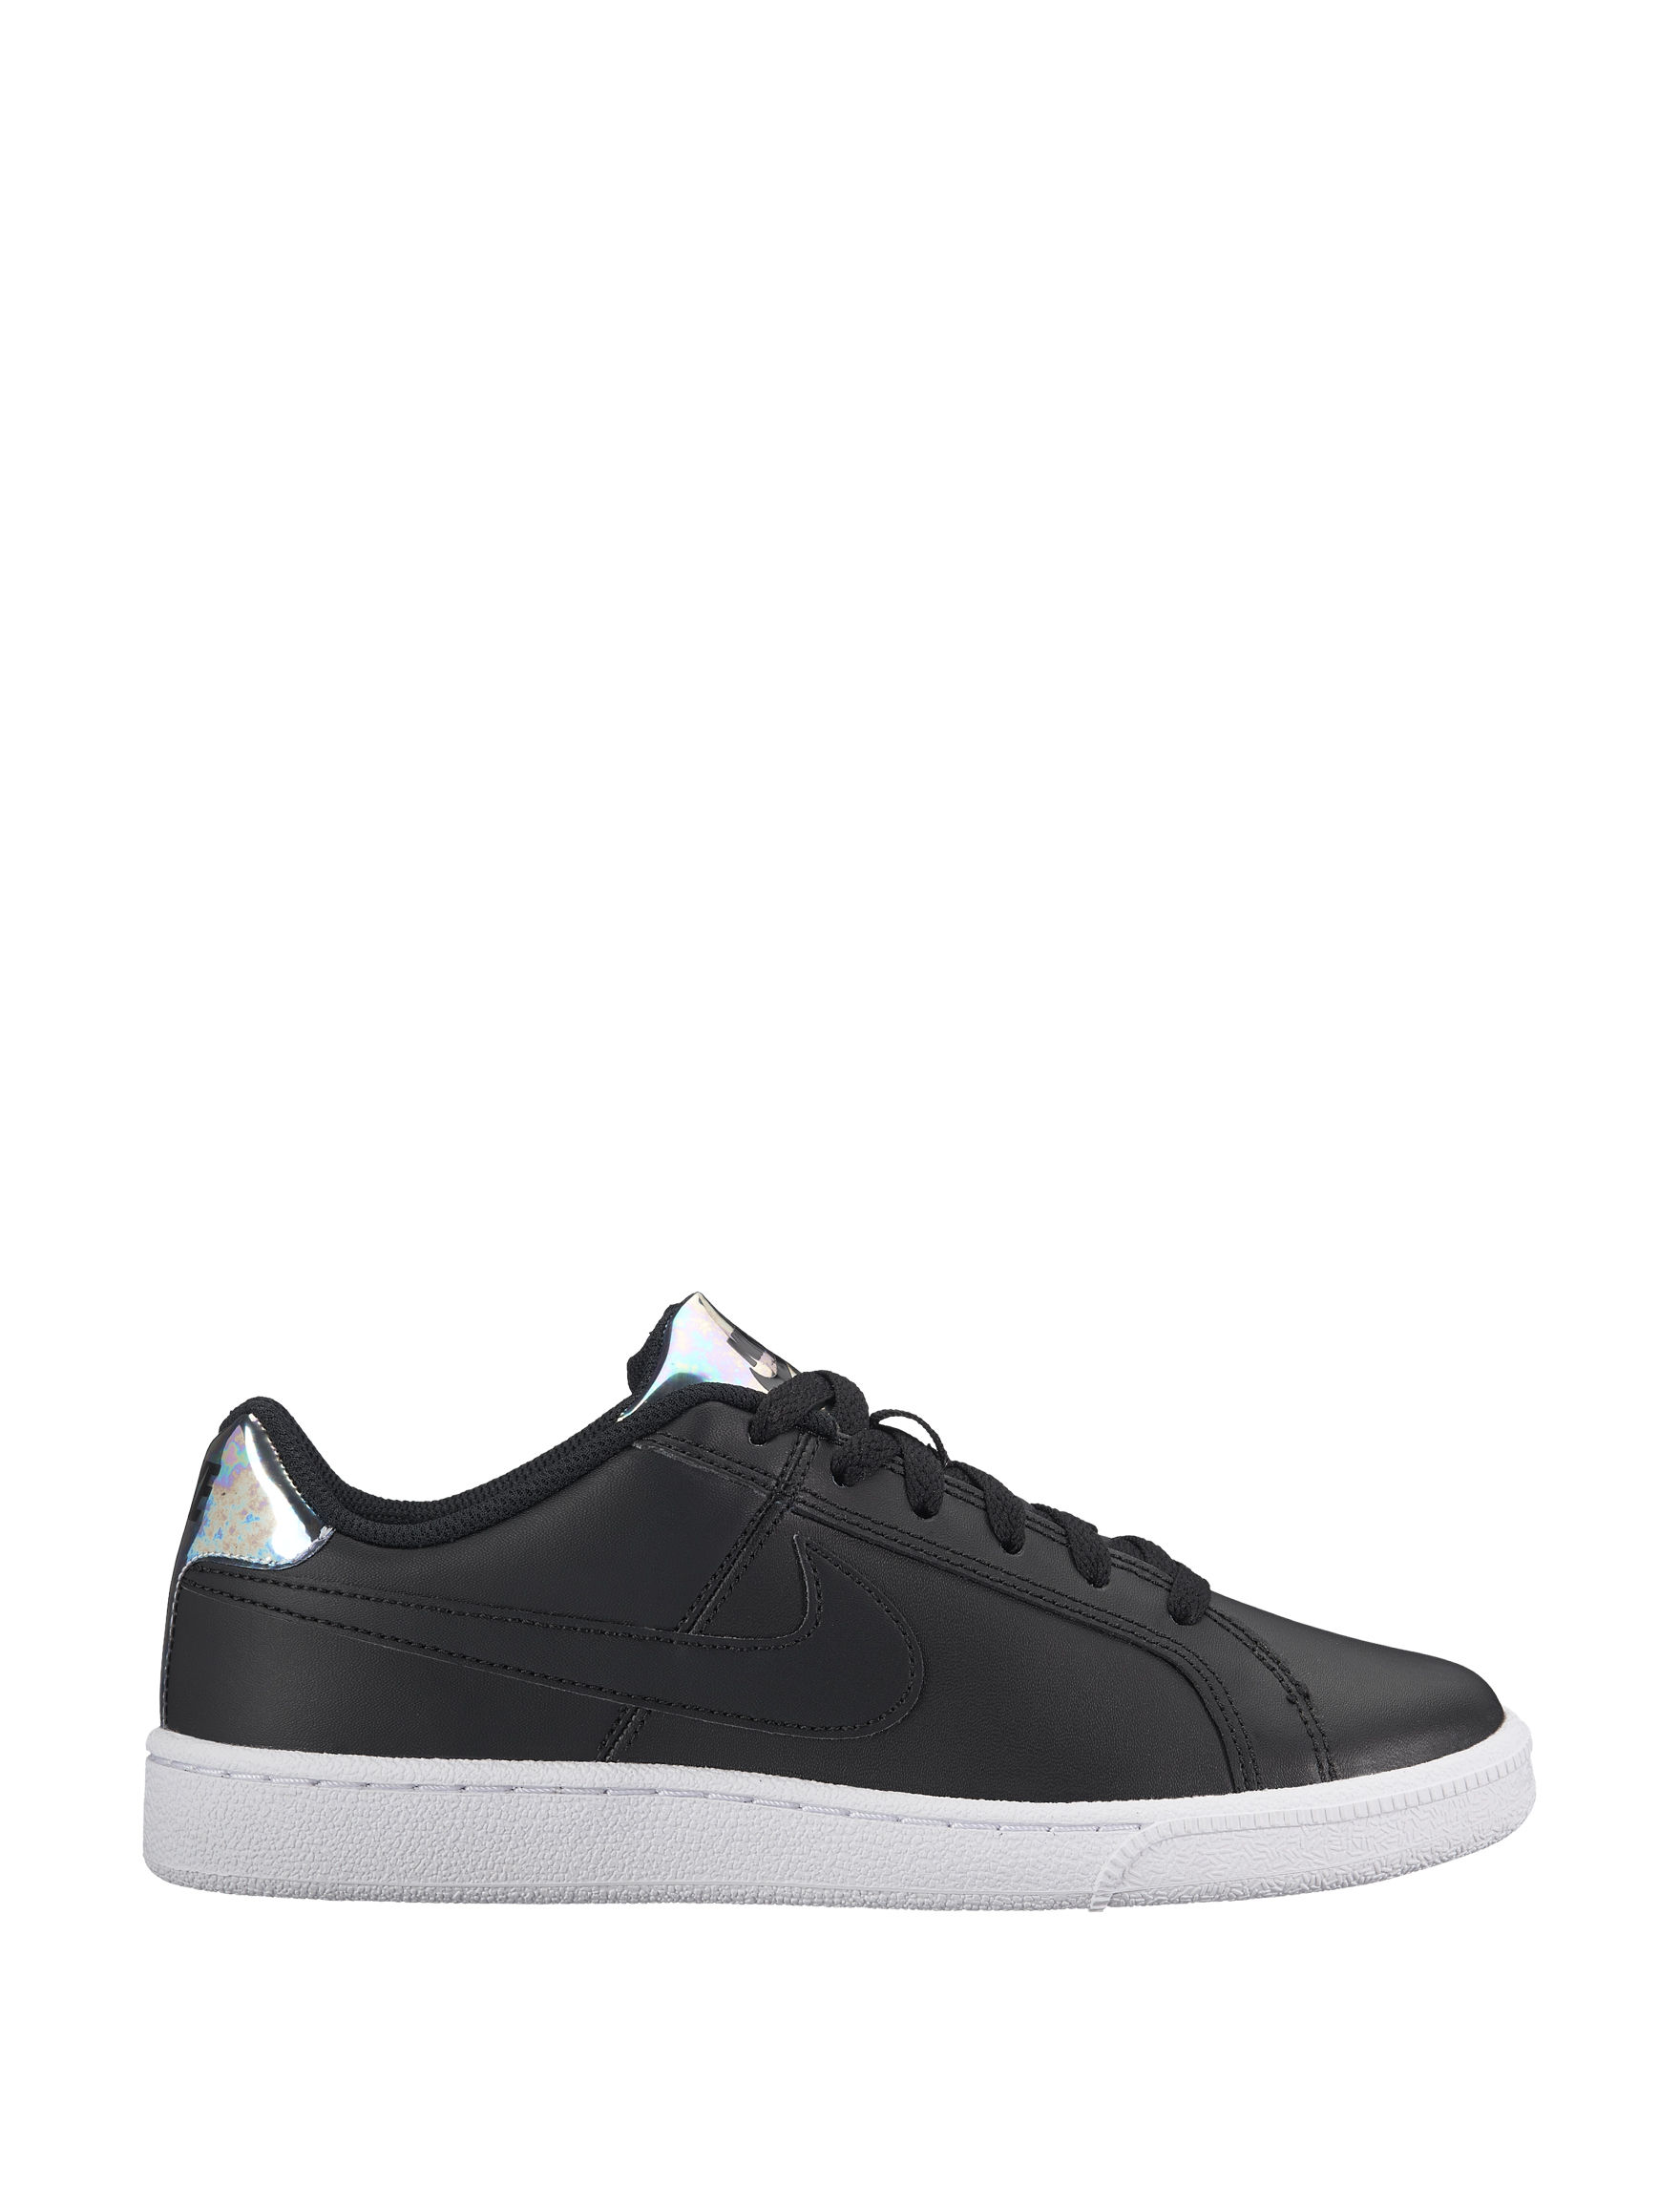 Nike Black / Silver